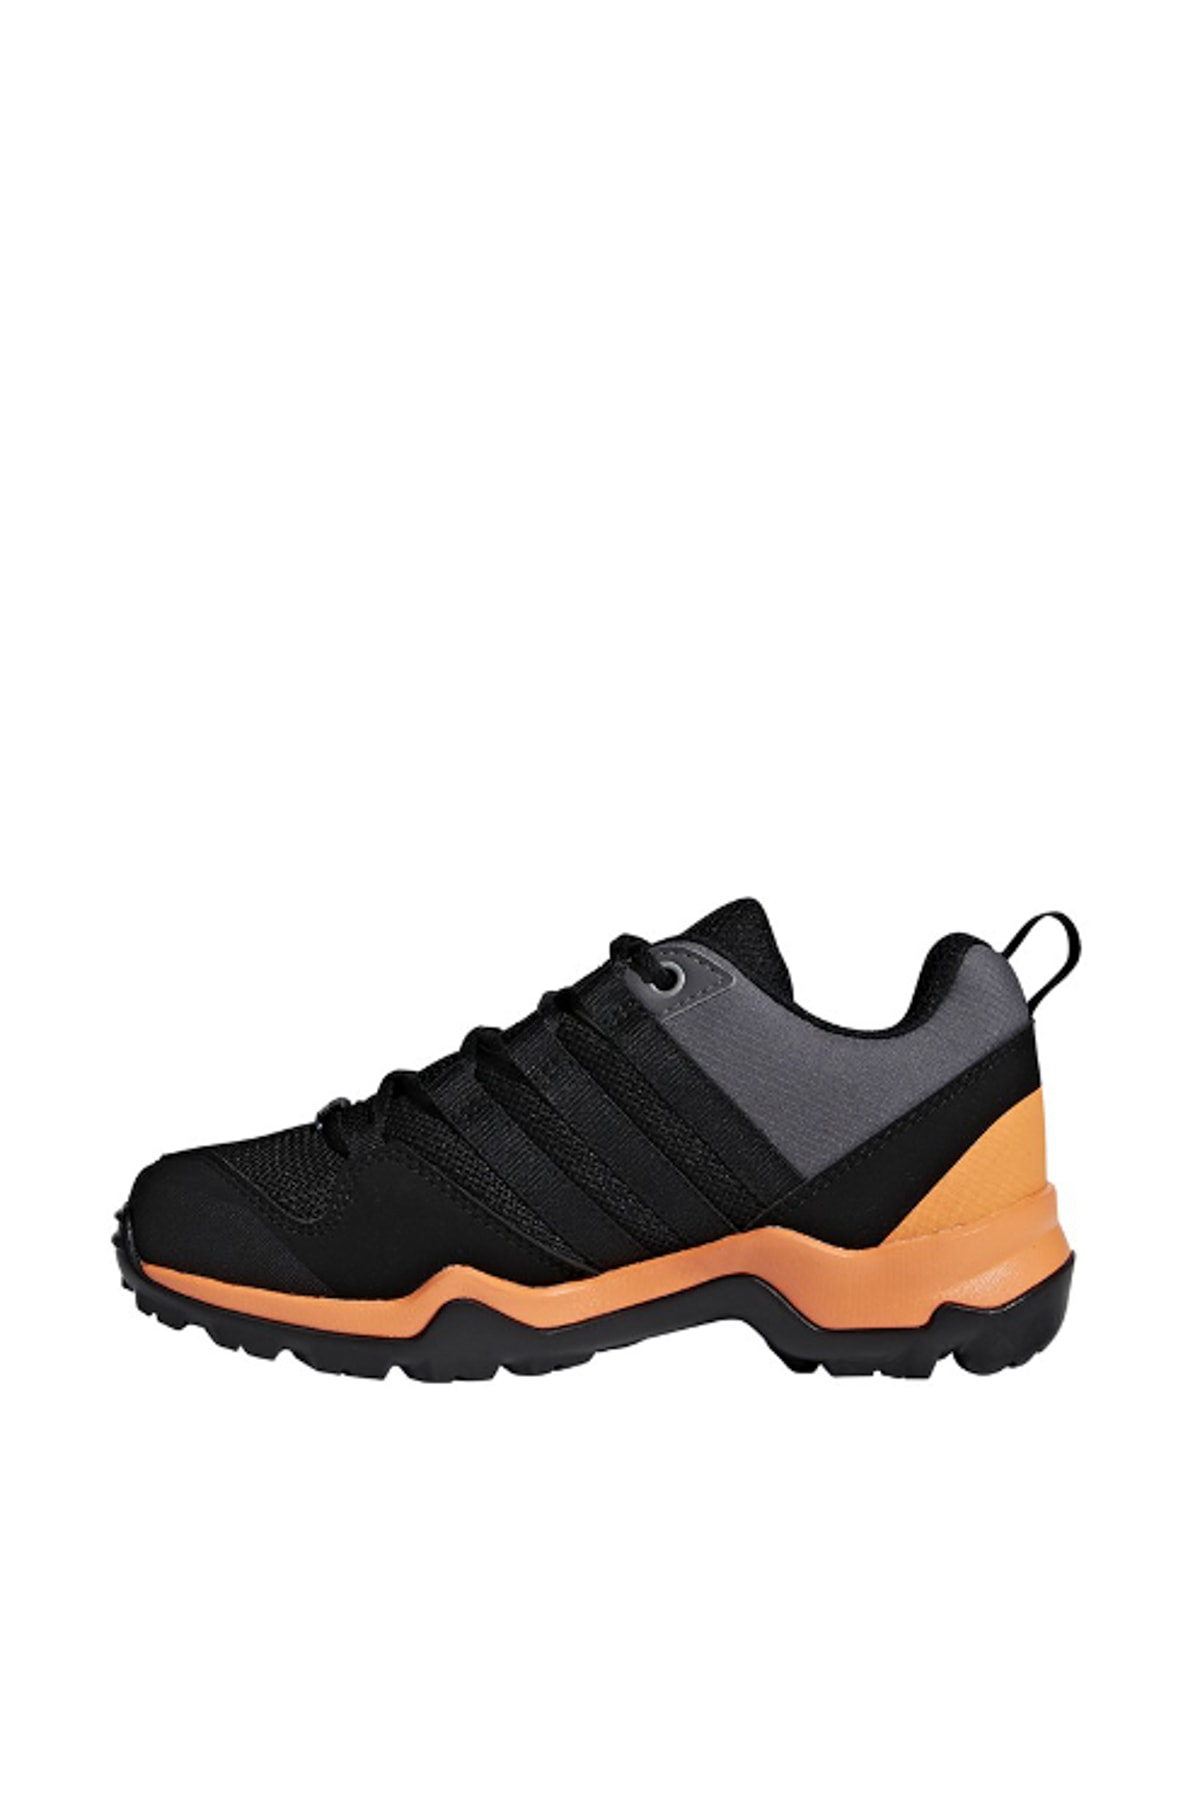 adidas TERREX AX2R CP K Siyah Erkek Çocuk Sneaker Ayakkabı 100485246 2